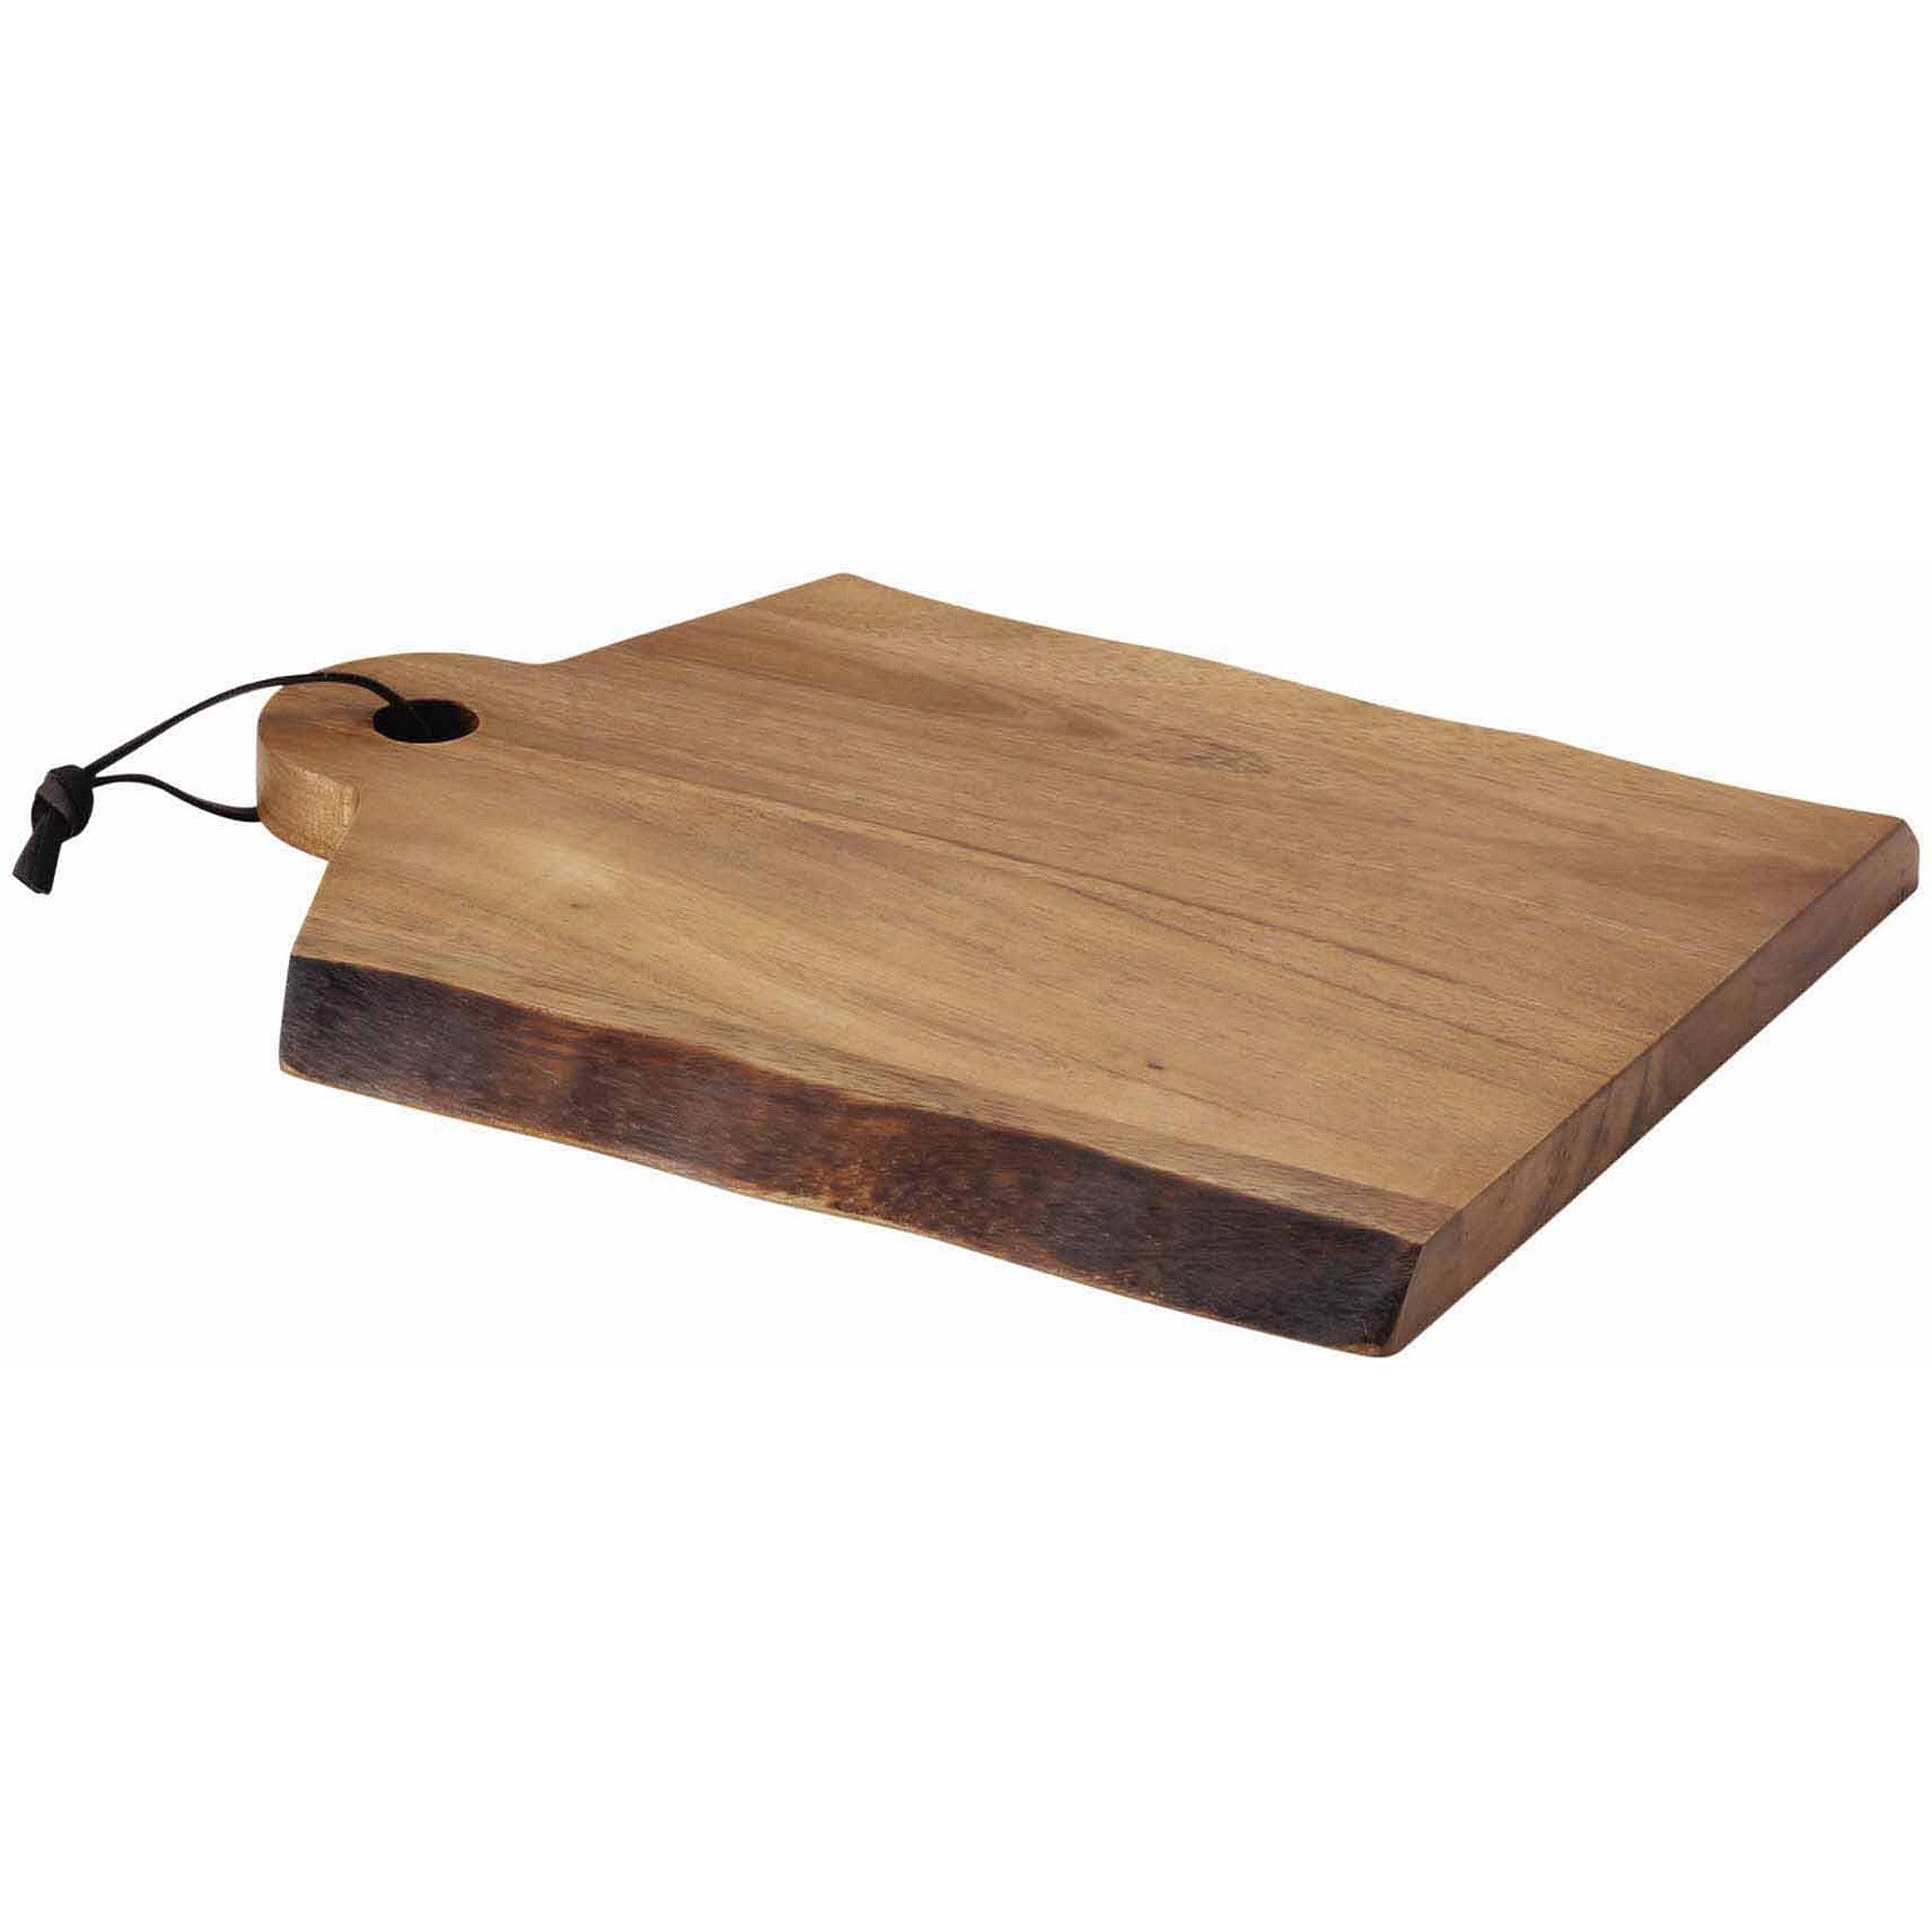 Rachael Ray Cucina Pantryware 14 X 11 Wood Cutting Board With Handle